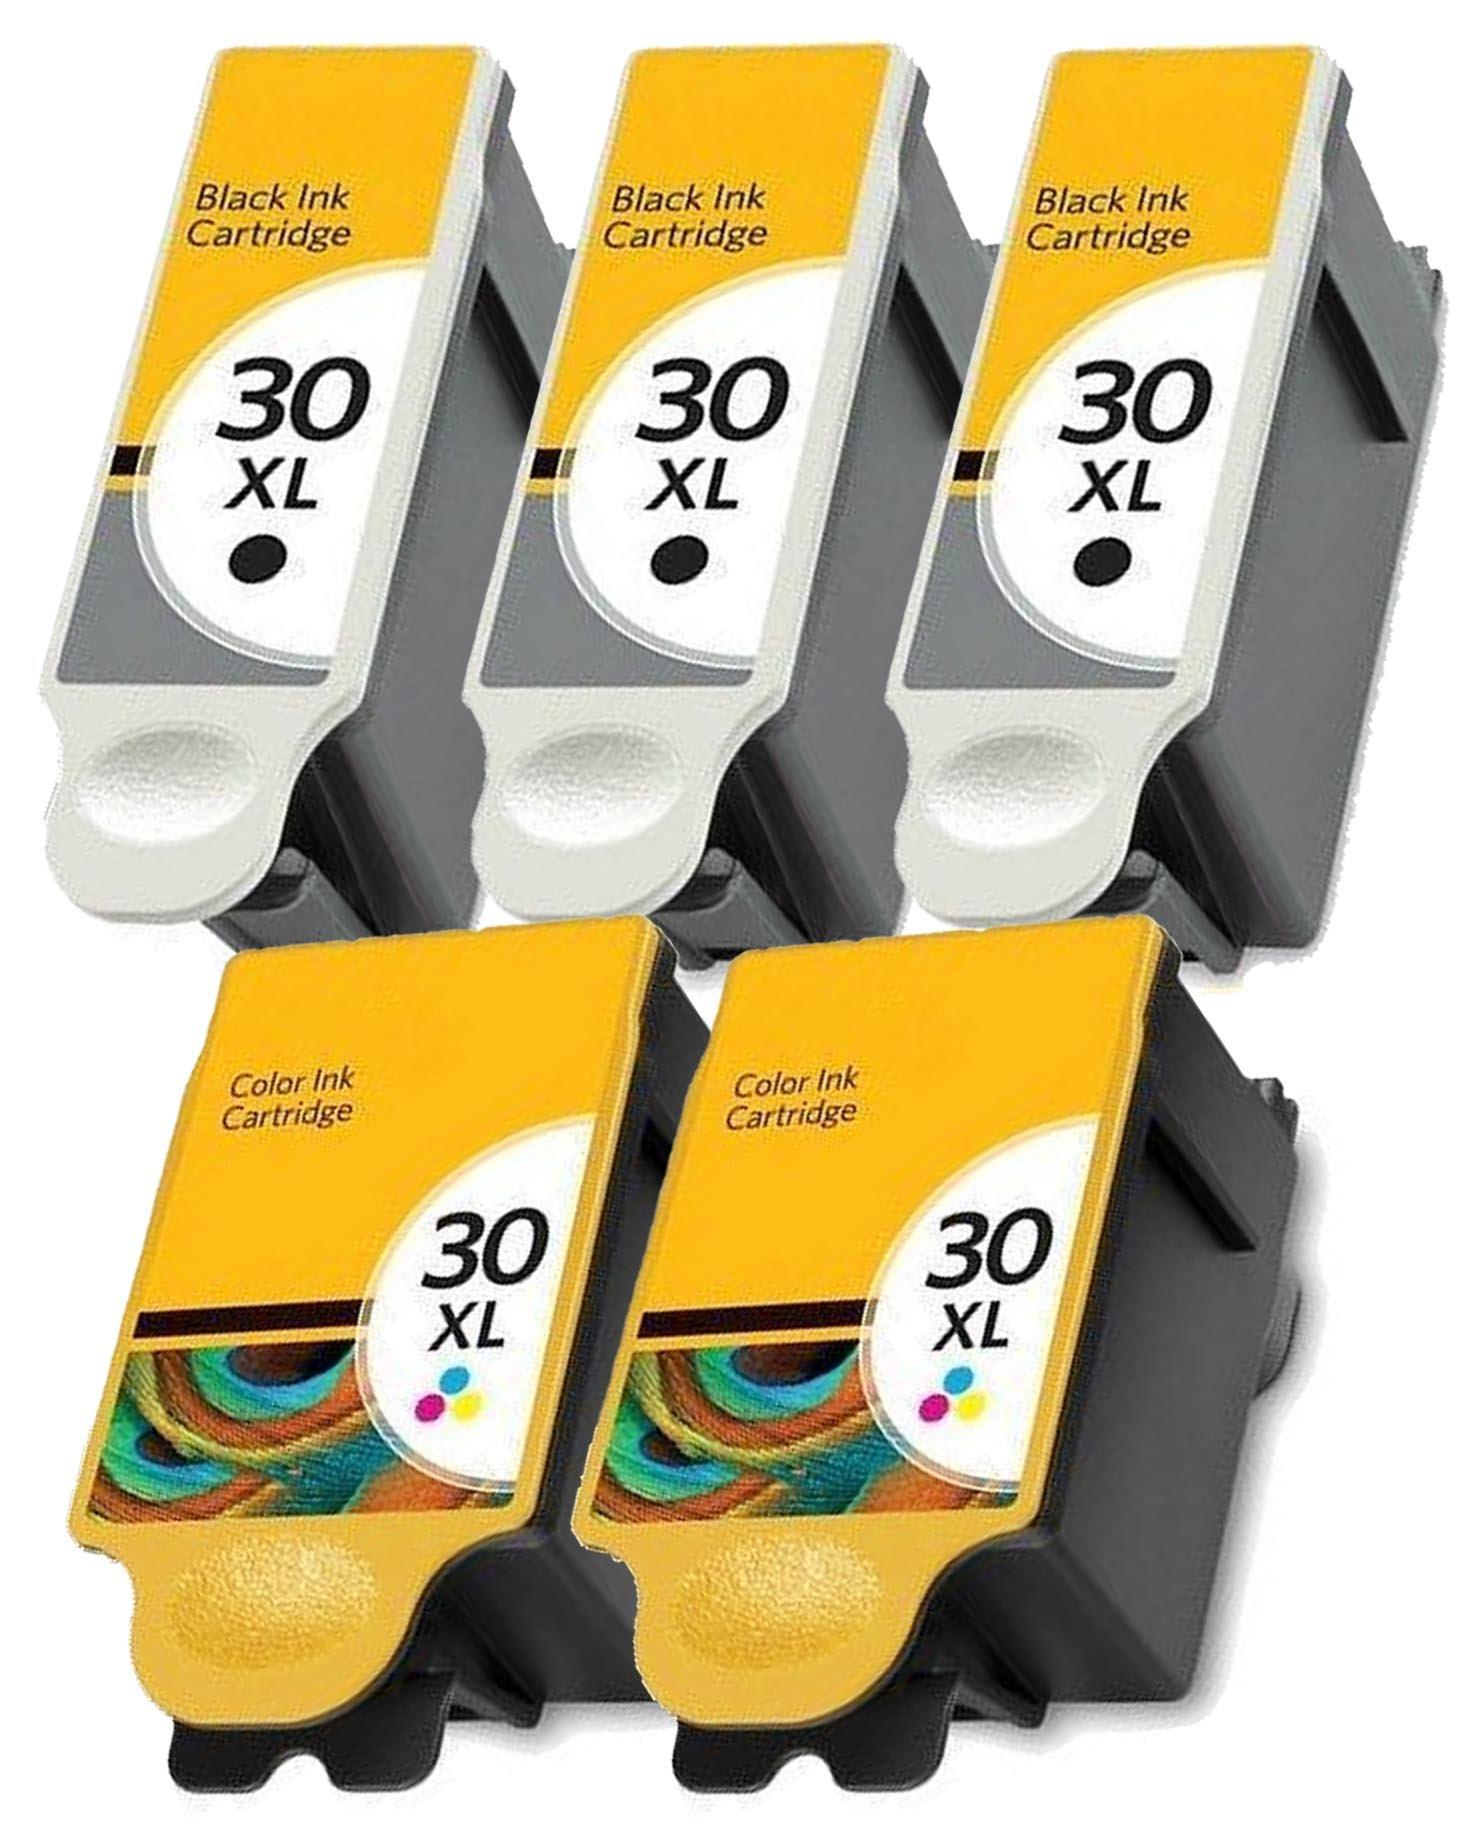 Cartlee Set of 5 Compatible 30xl High Yield Ink Cartridges for Kodak Hero 3.1 Hero 5.1 ESP 3.2 ESP C110 ESP C310 ESP Office 2150, ESP C315, ESP Office 2170